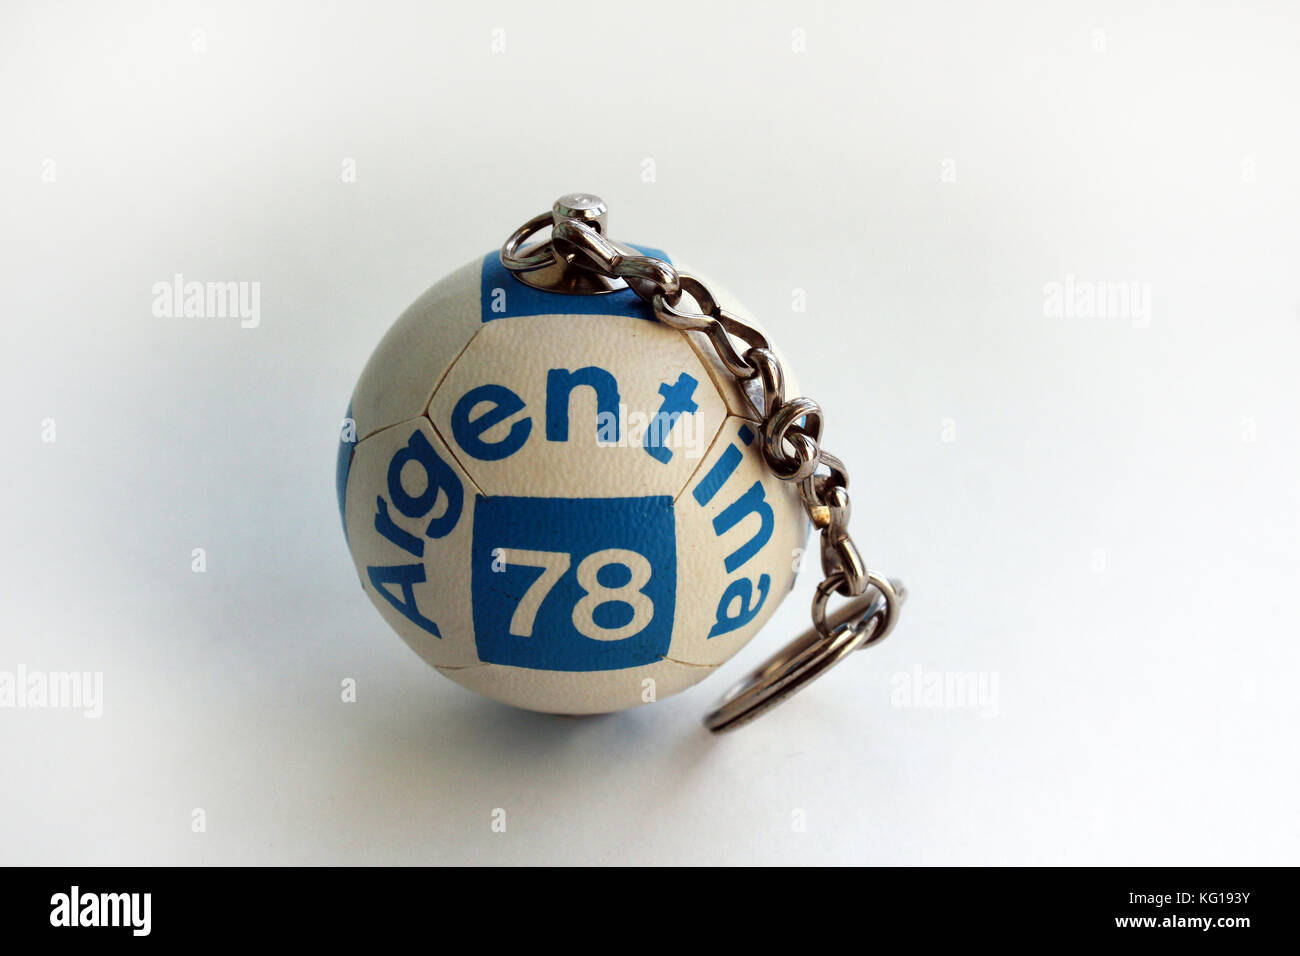 Vintage Football Argentina 1978 FIFA World Cup souvenir portachiavi Immagini Stock